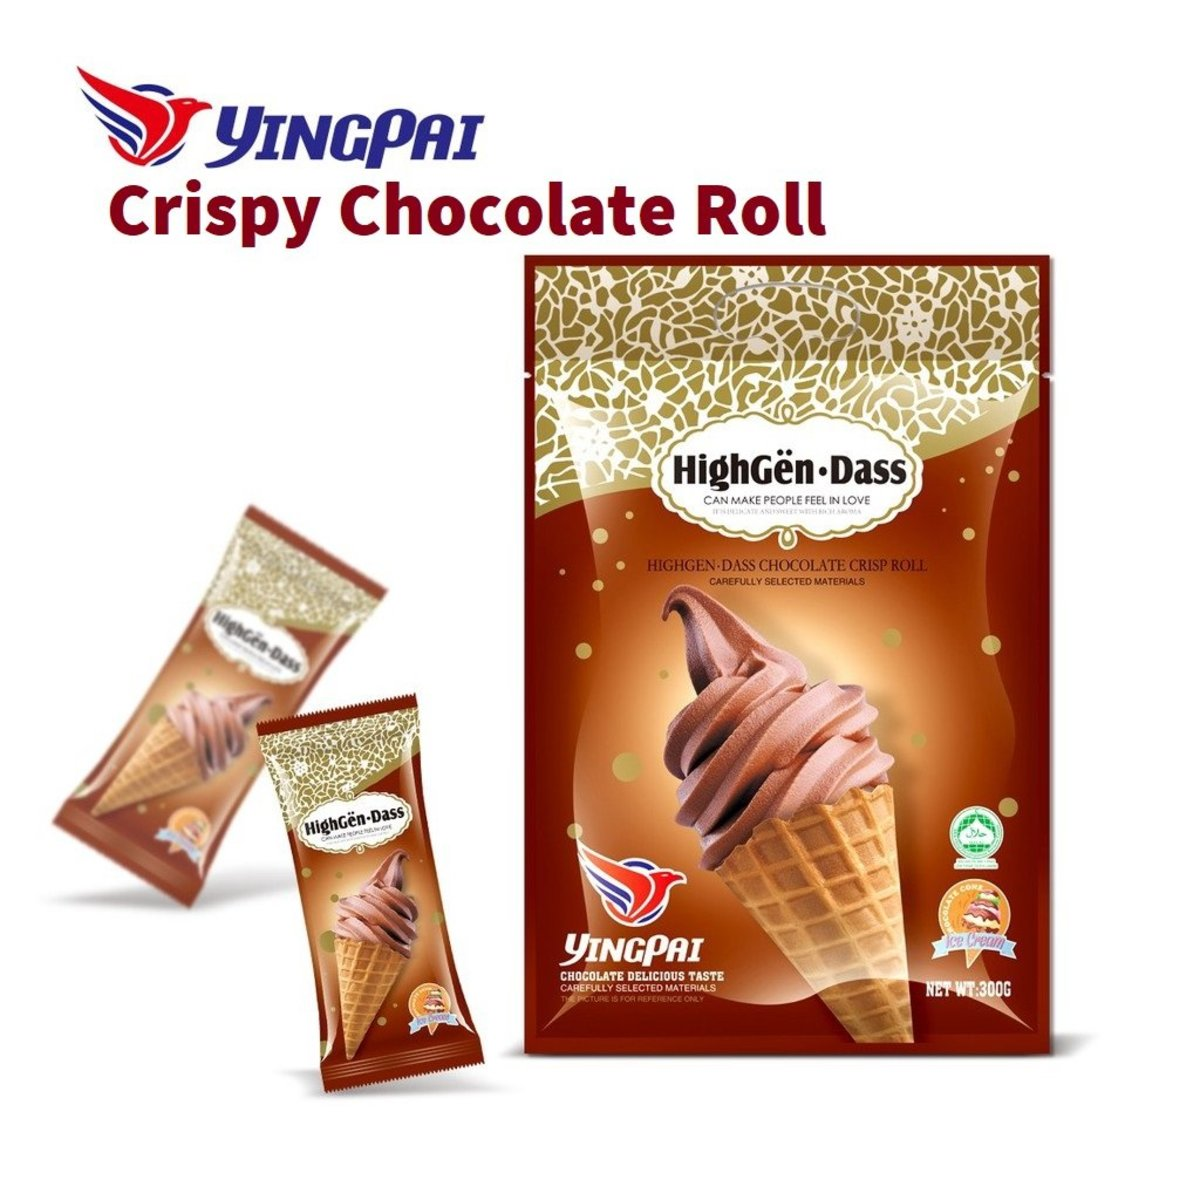 HighGen-Dass Crispy Chocolate Cone (300g)